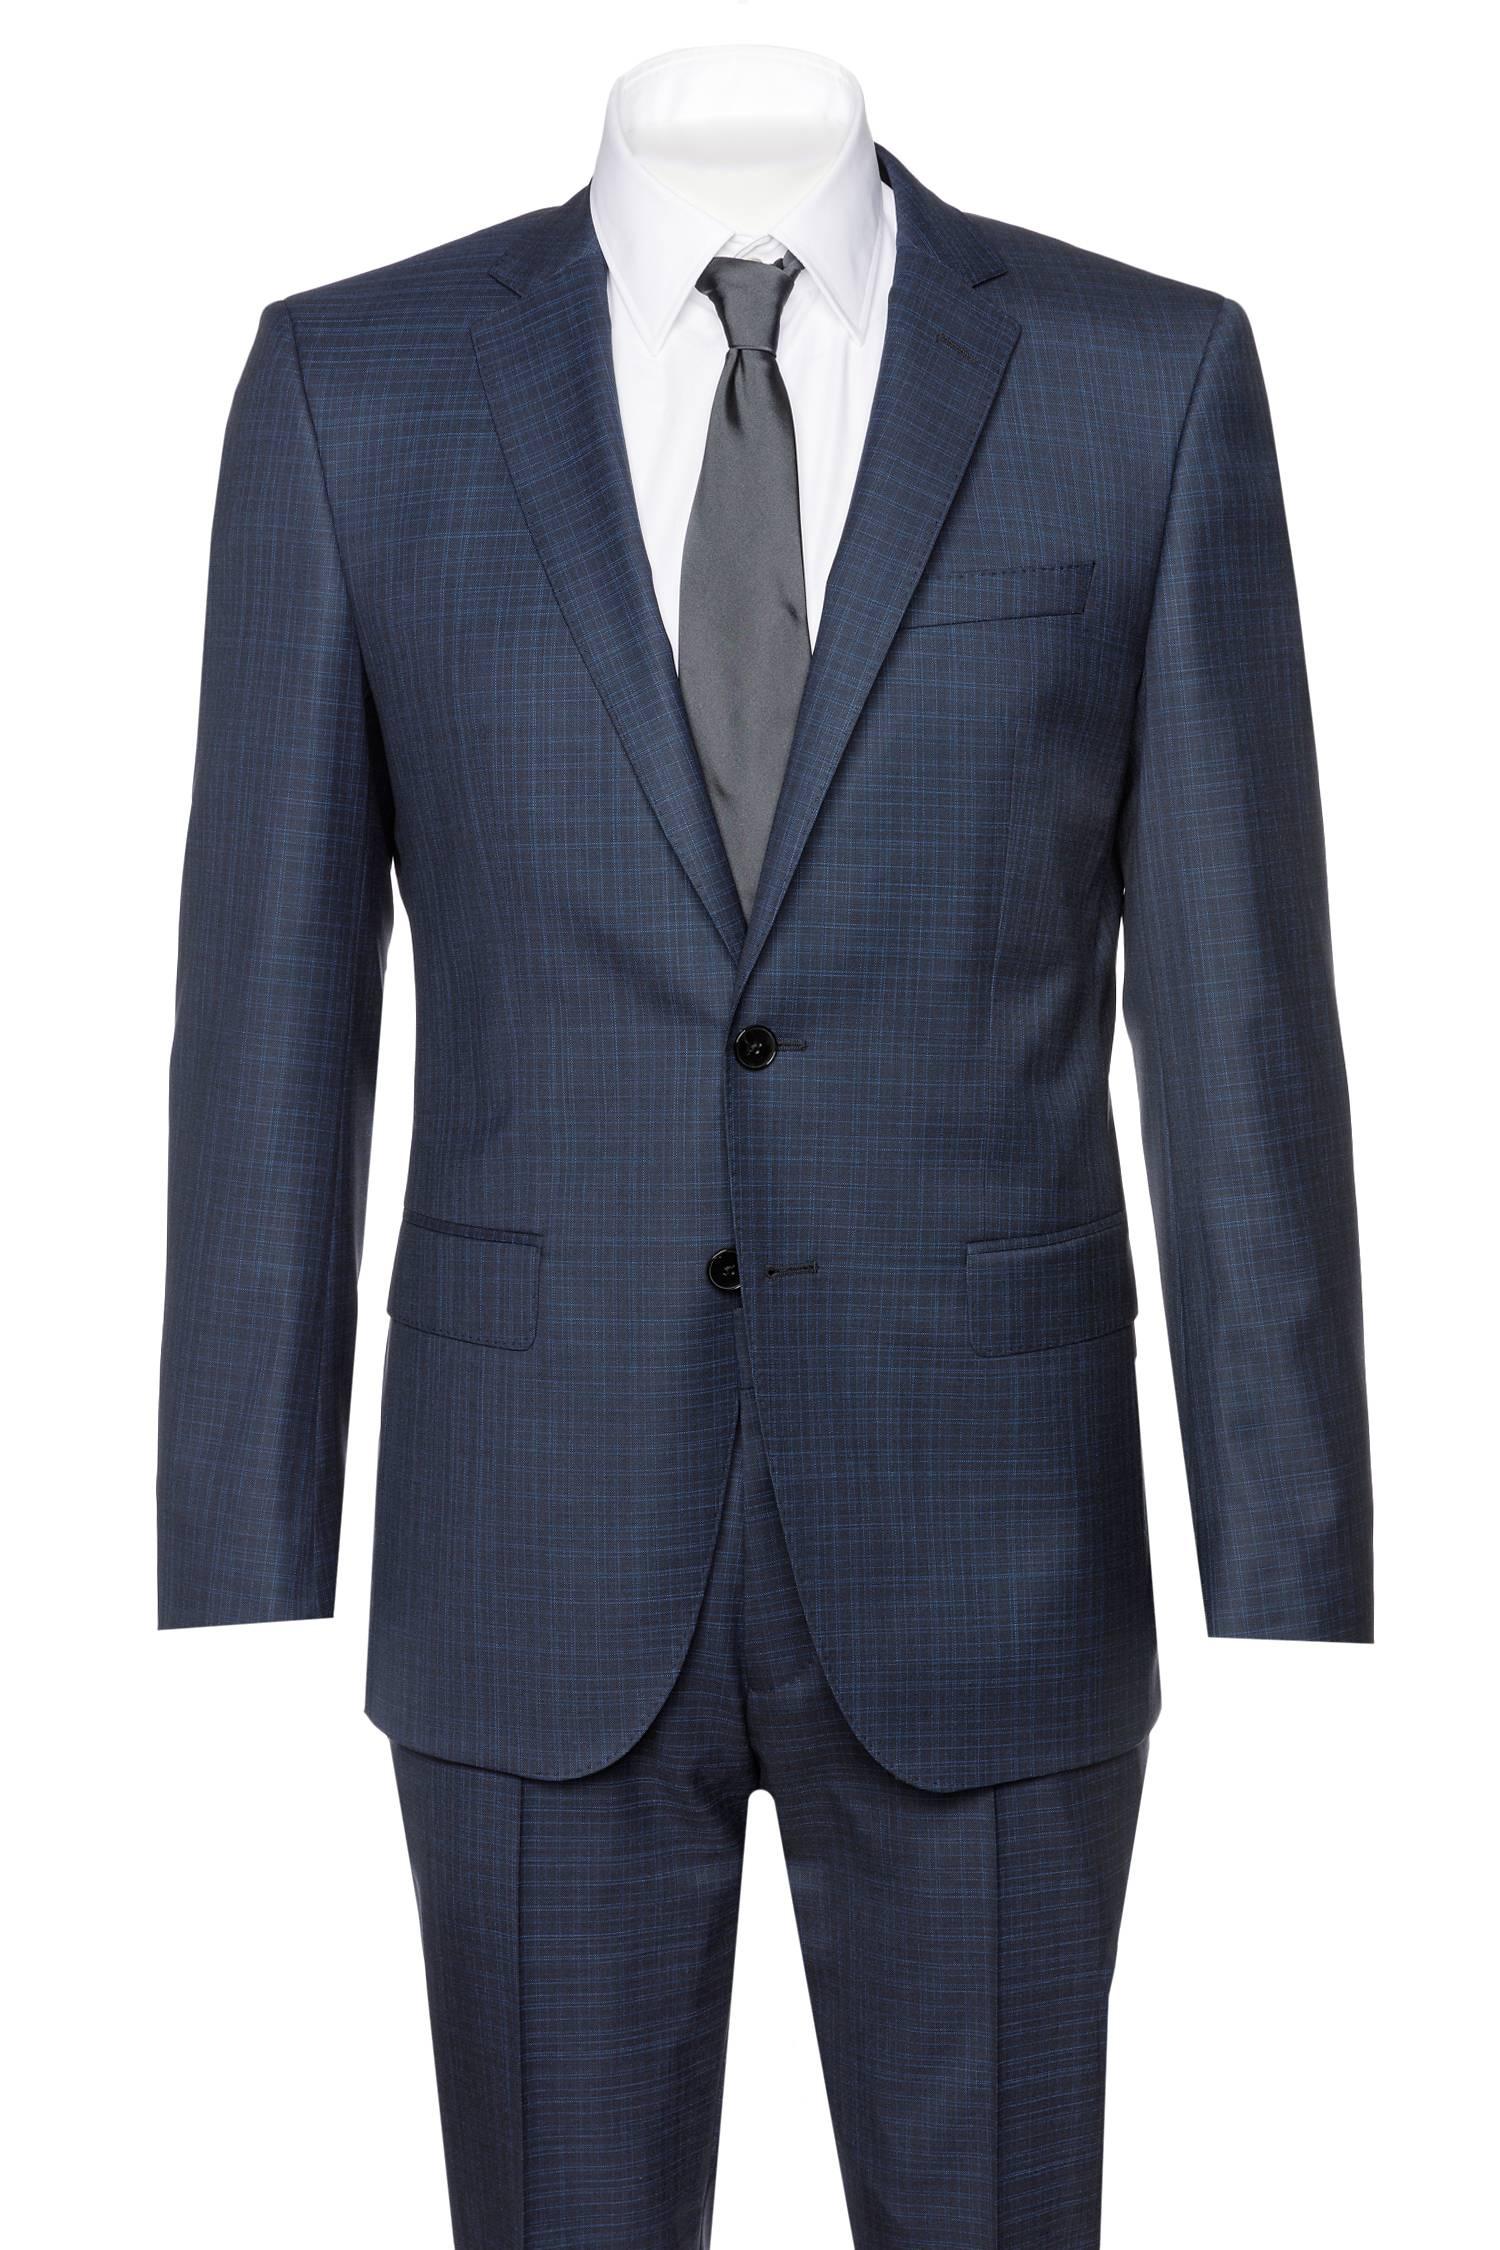 500e473fff52 BOSS Anzug Huge6 Genius5 Blau Karo NEU Business Slim Fit   eBay